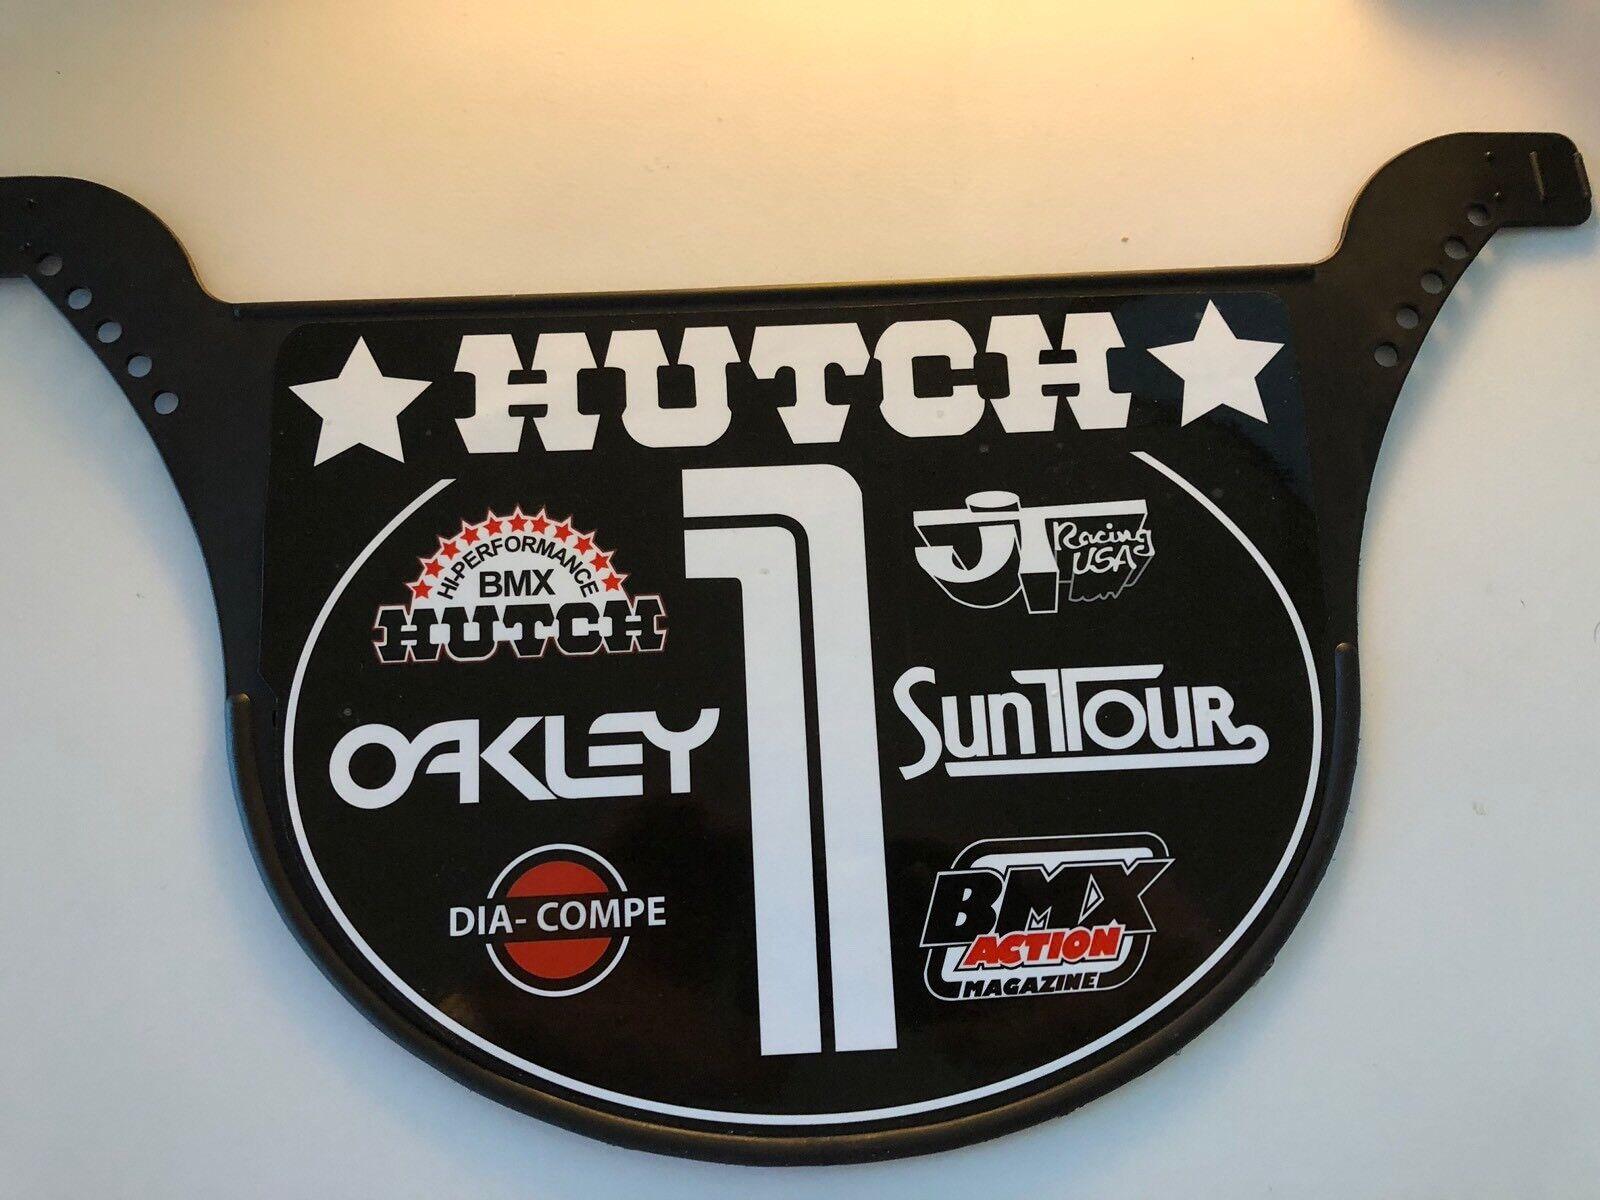 Old School Predo Plate BMX Number plate by NEAL Enterprises - HUTCH BMX